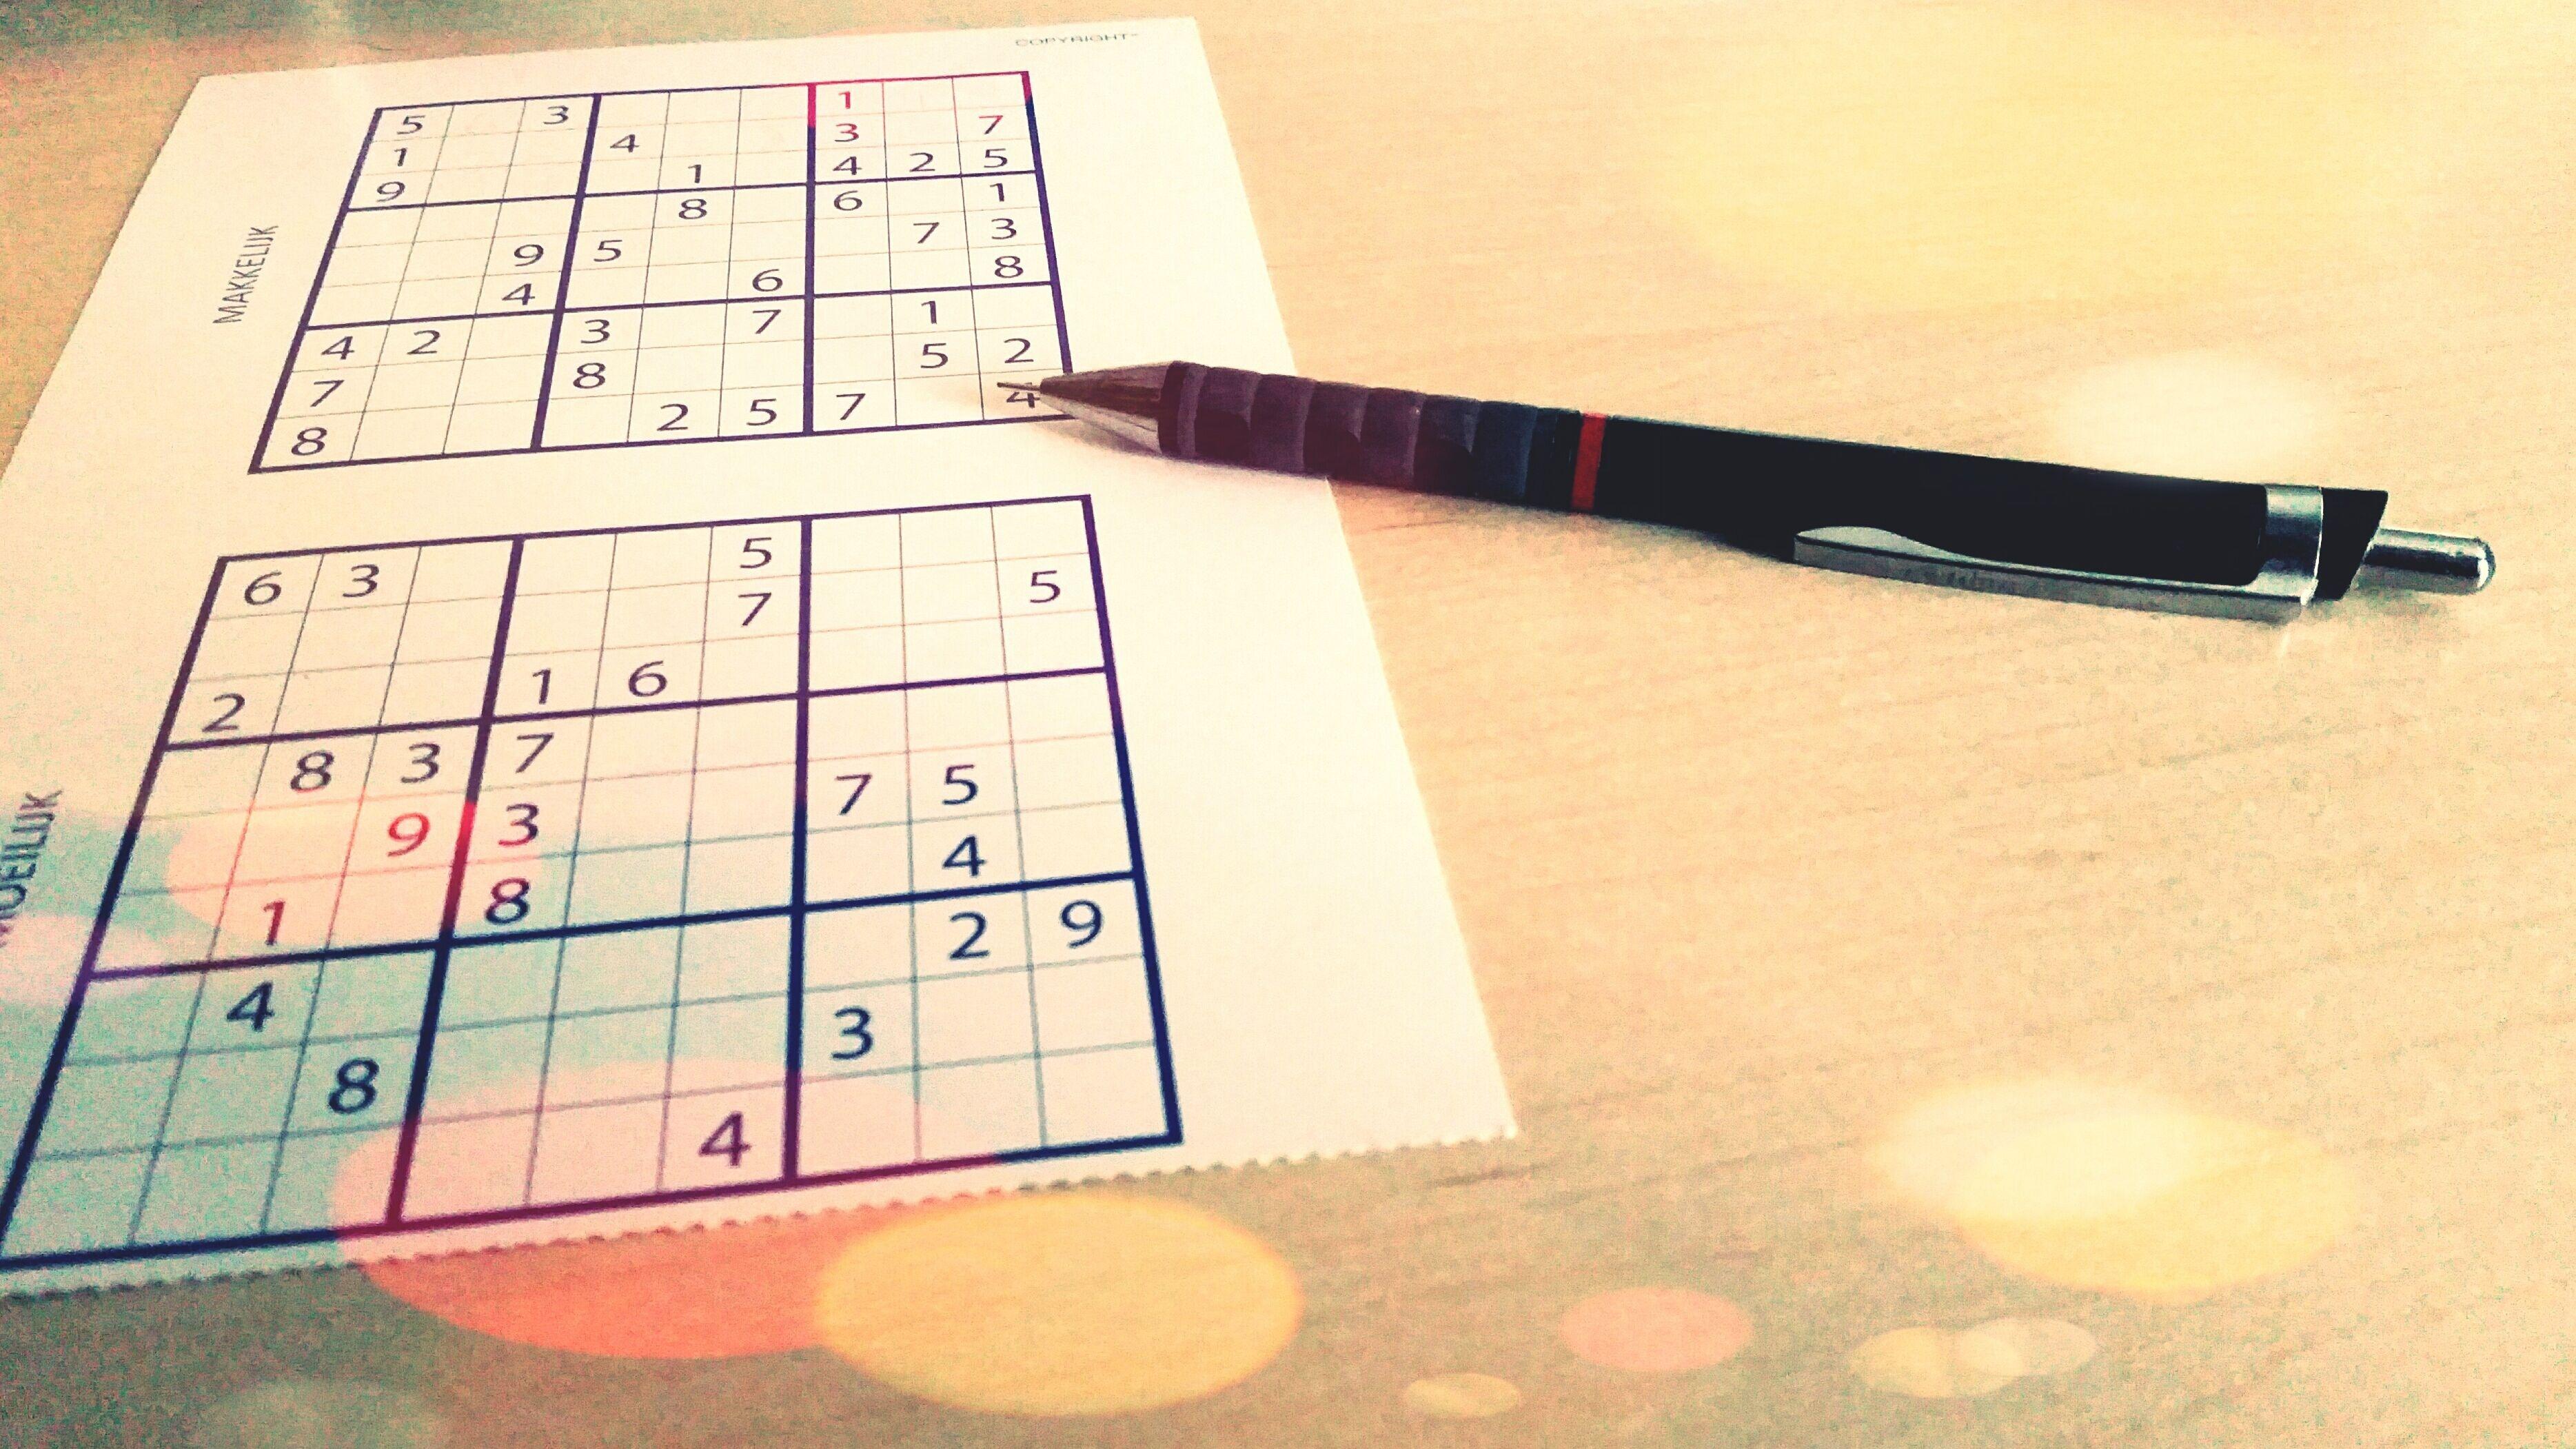 Free Printable Sudoku Puzzles For All Abilities - Free Printable Futoshiki Puzzles